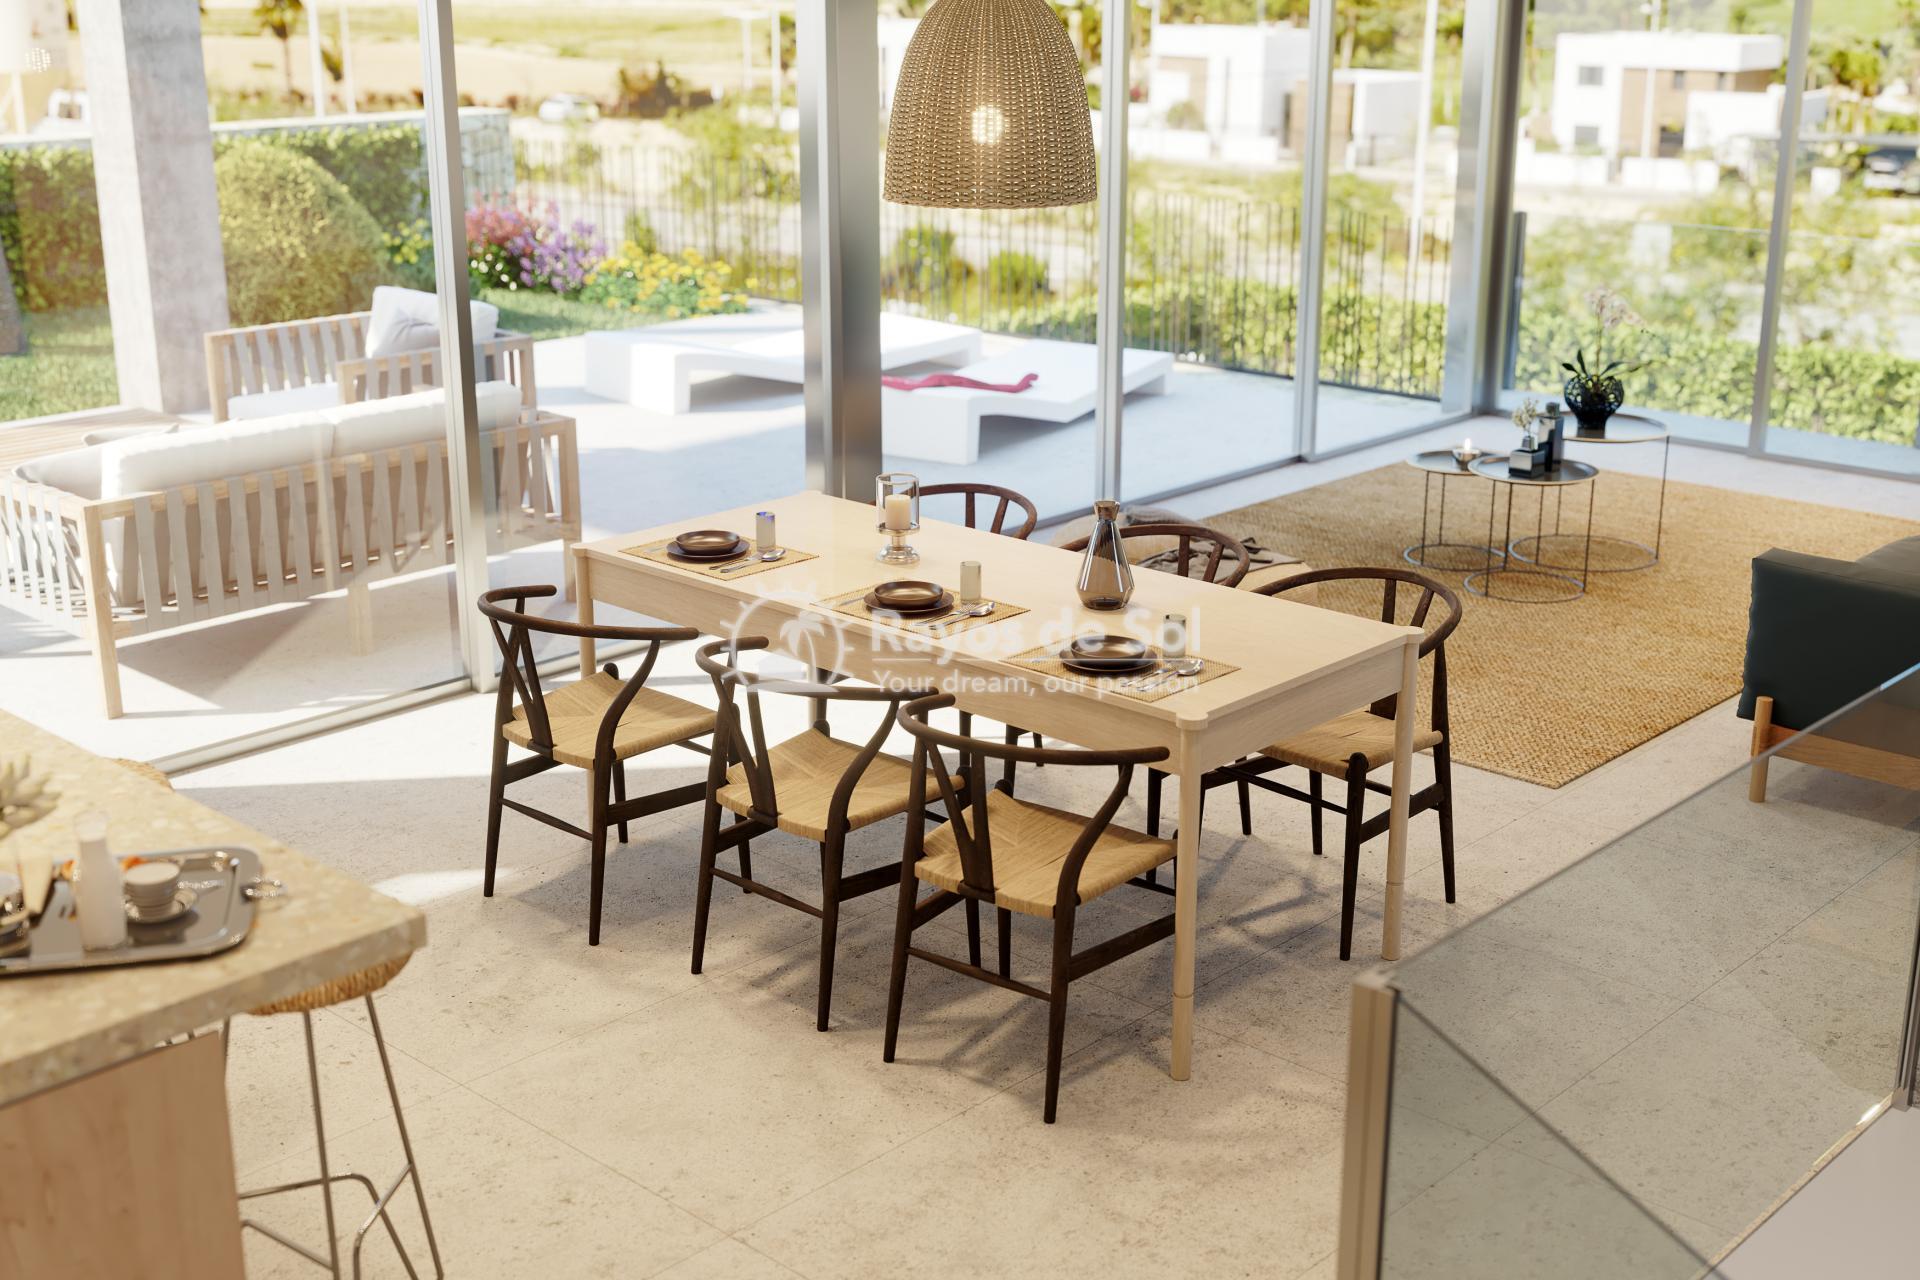 Luxury newbuild villa in La Finca Golf, Algorfa, Costa Blanca (LFPADI) - 11